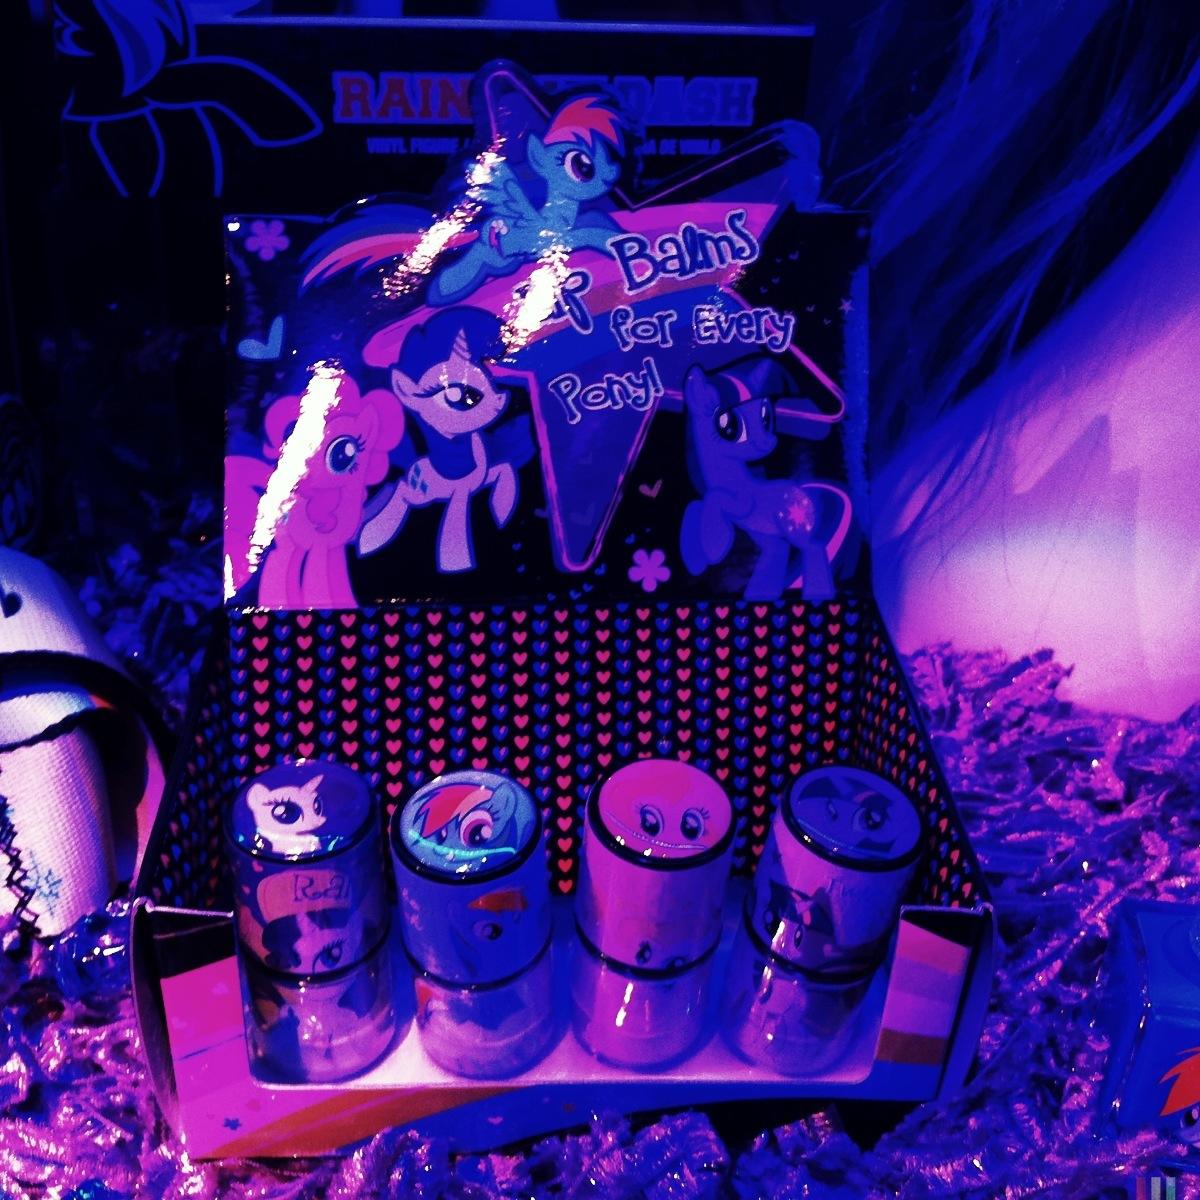 201-toyfair-hasbro10.JPG